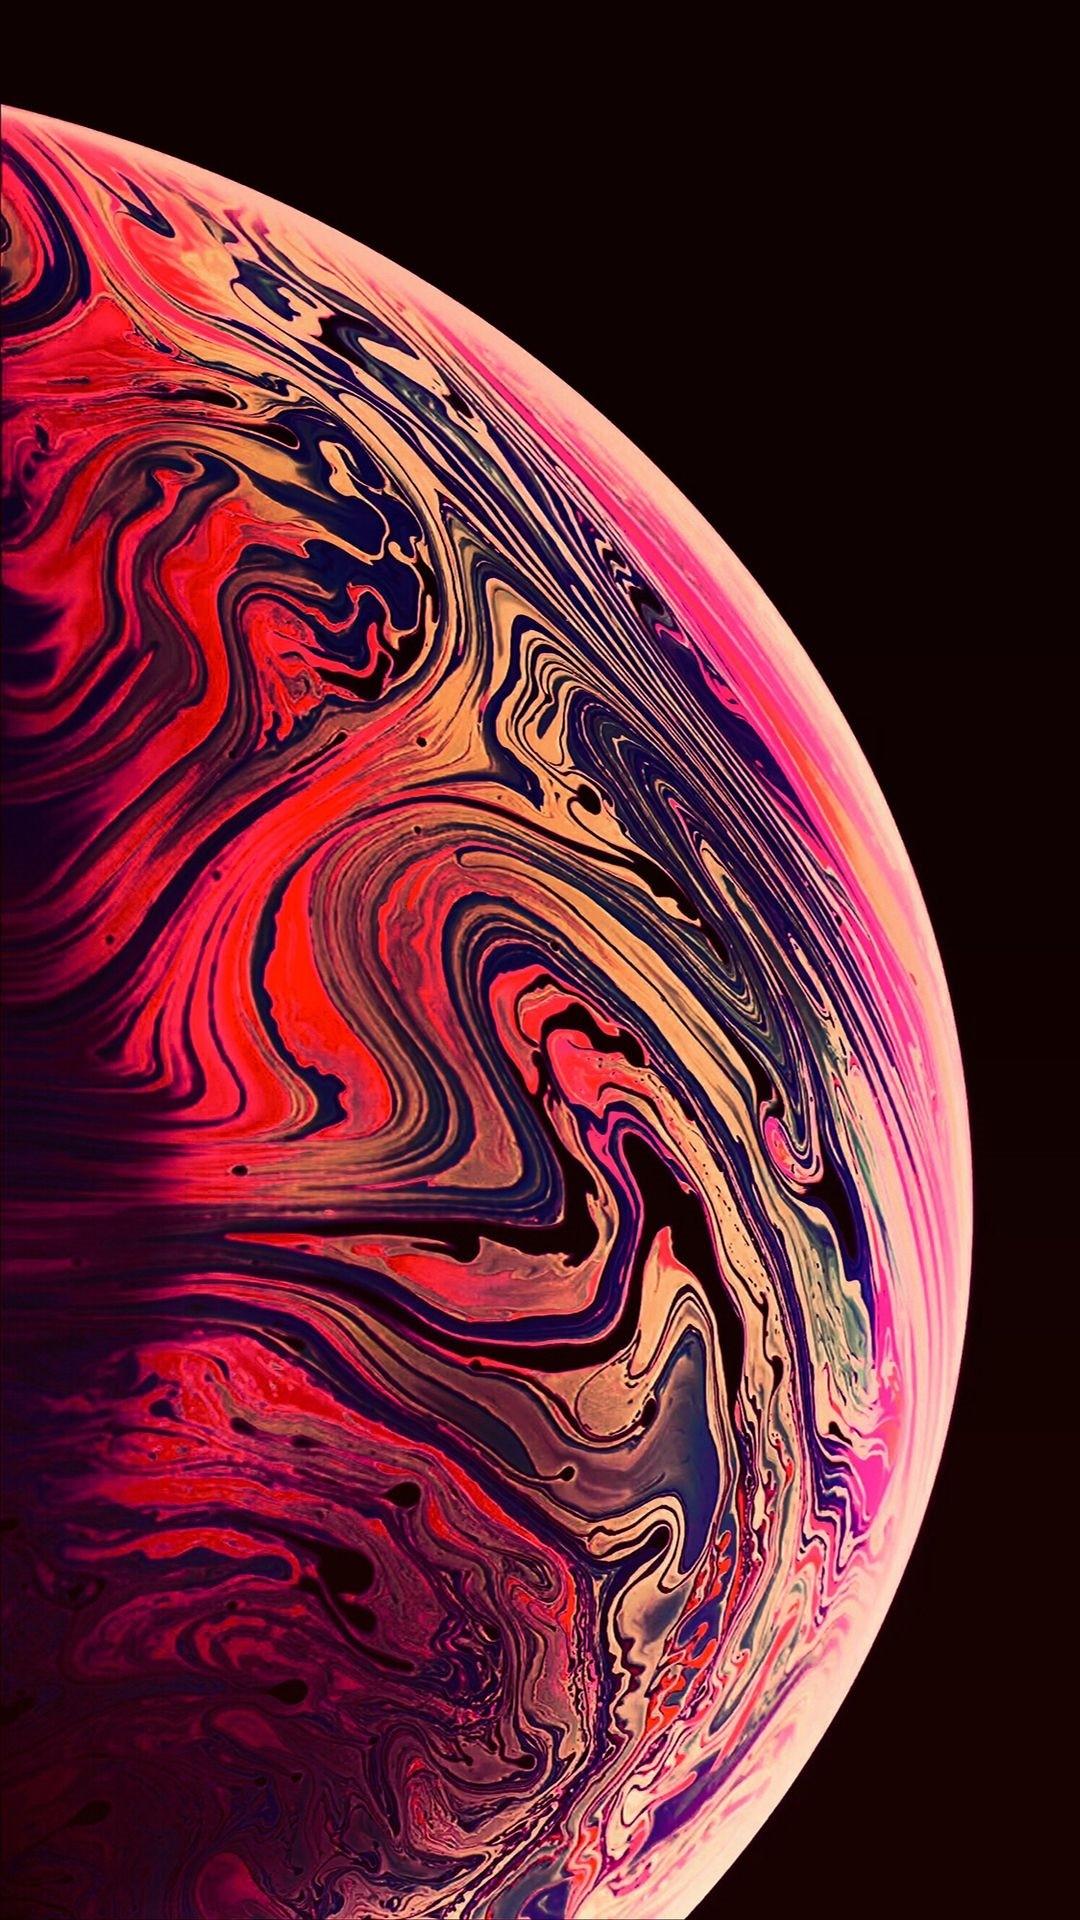 Planet iPhone wallpaper